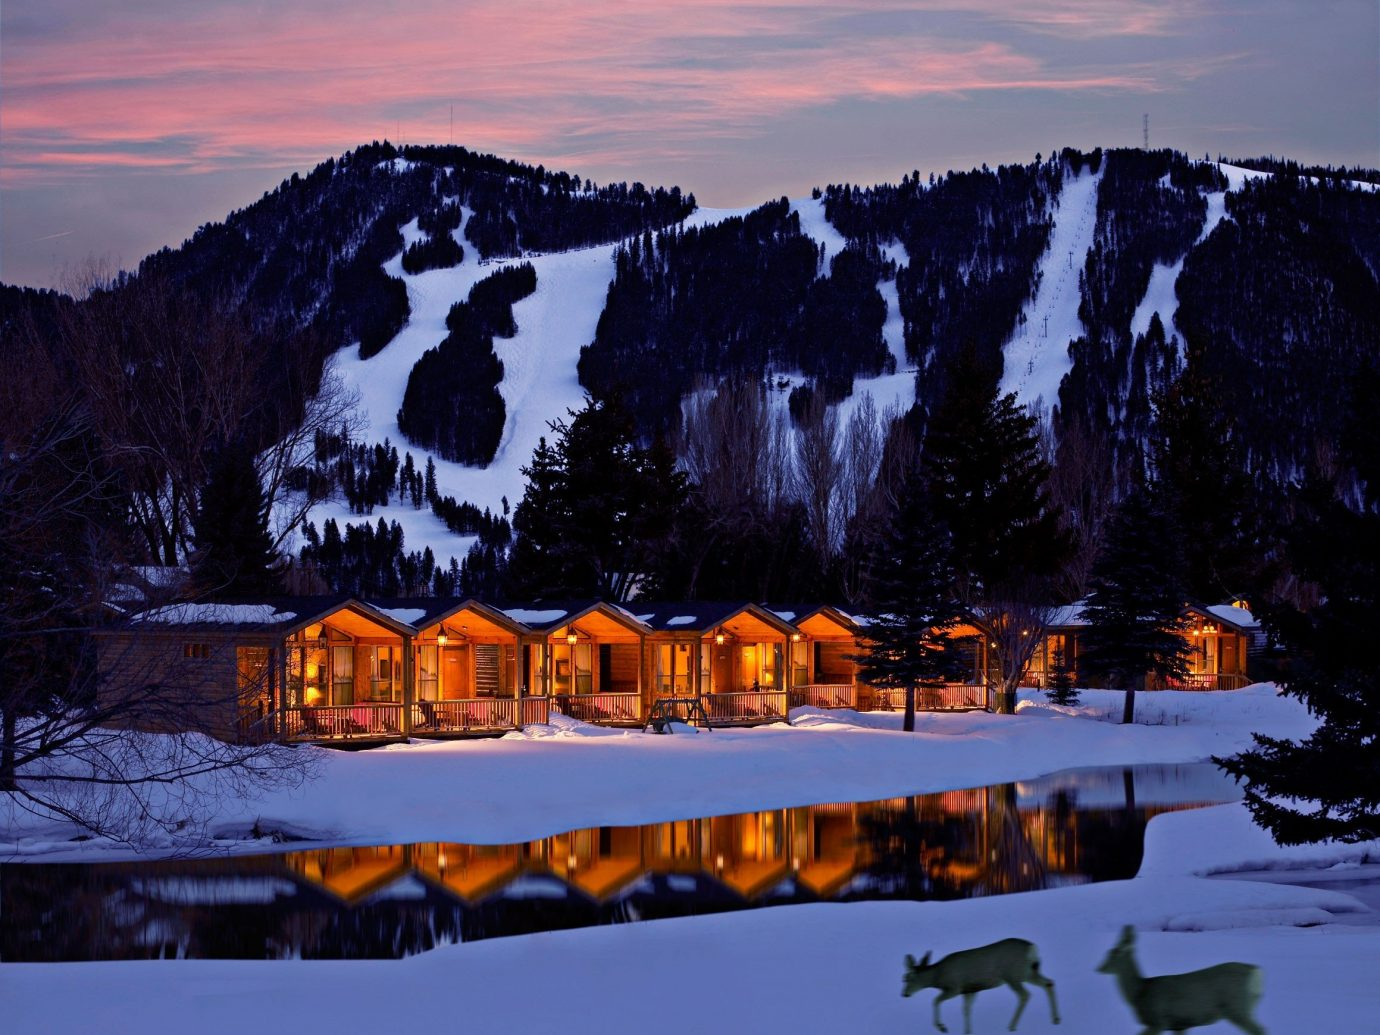 7 Cozy Cabins For A Winter Getaway